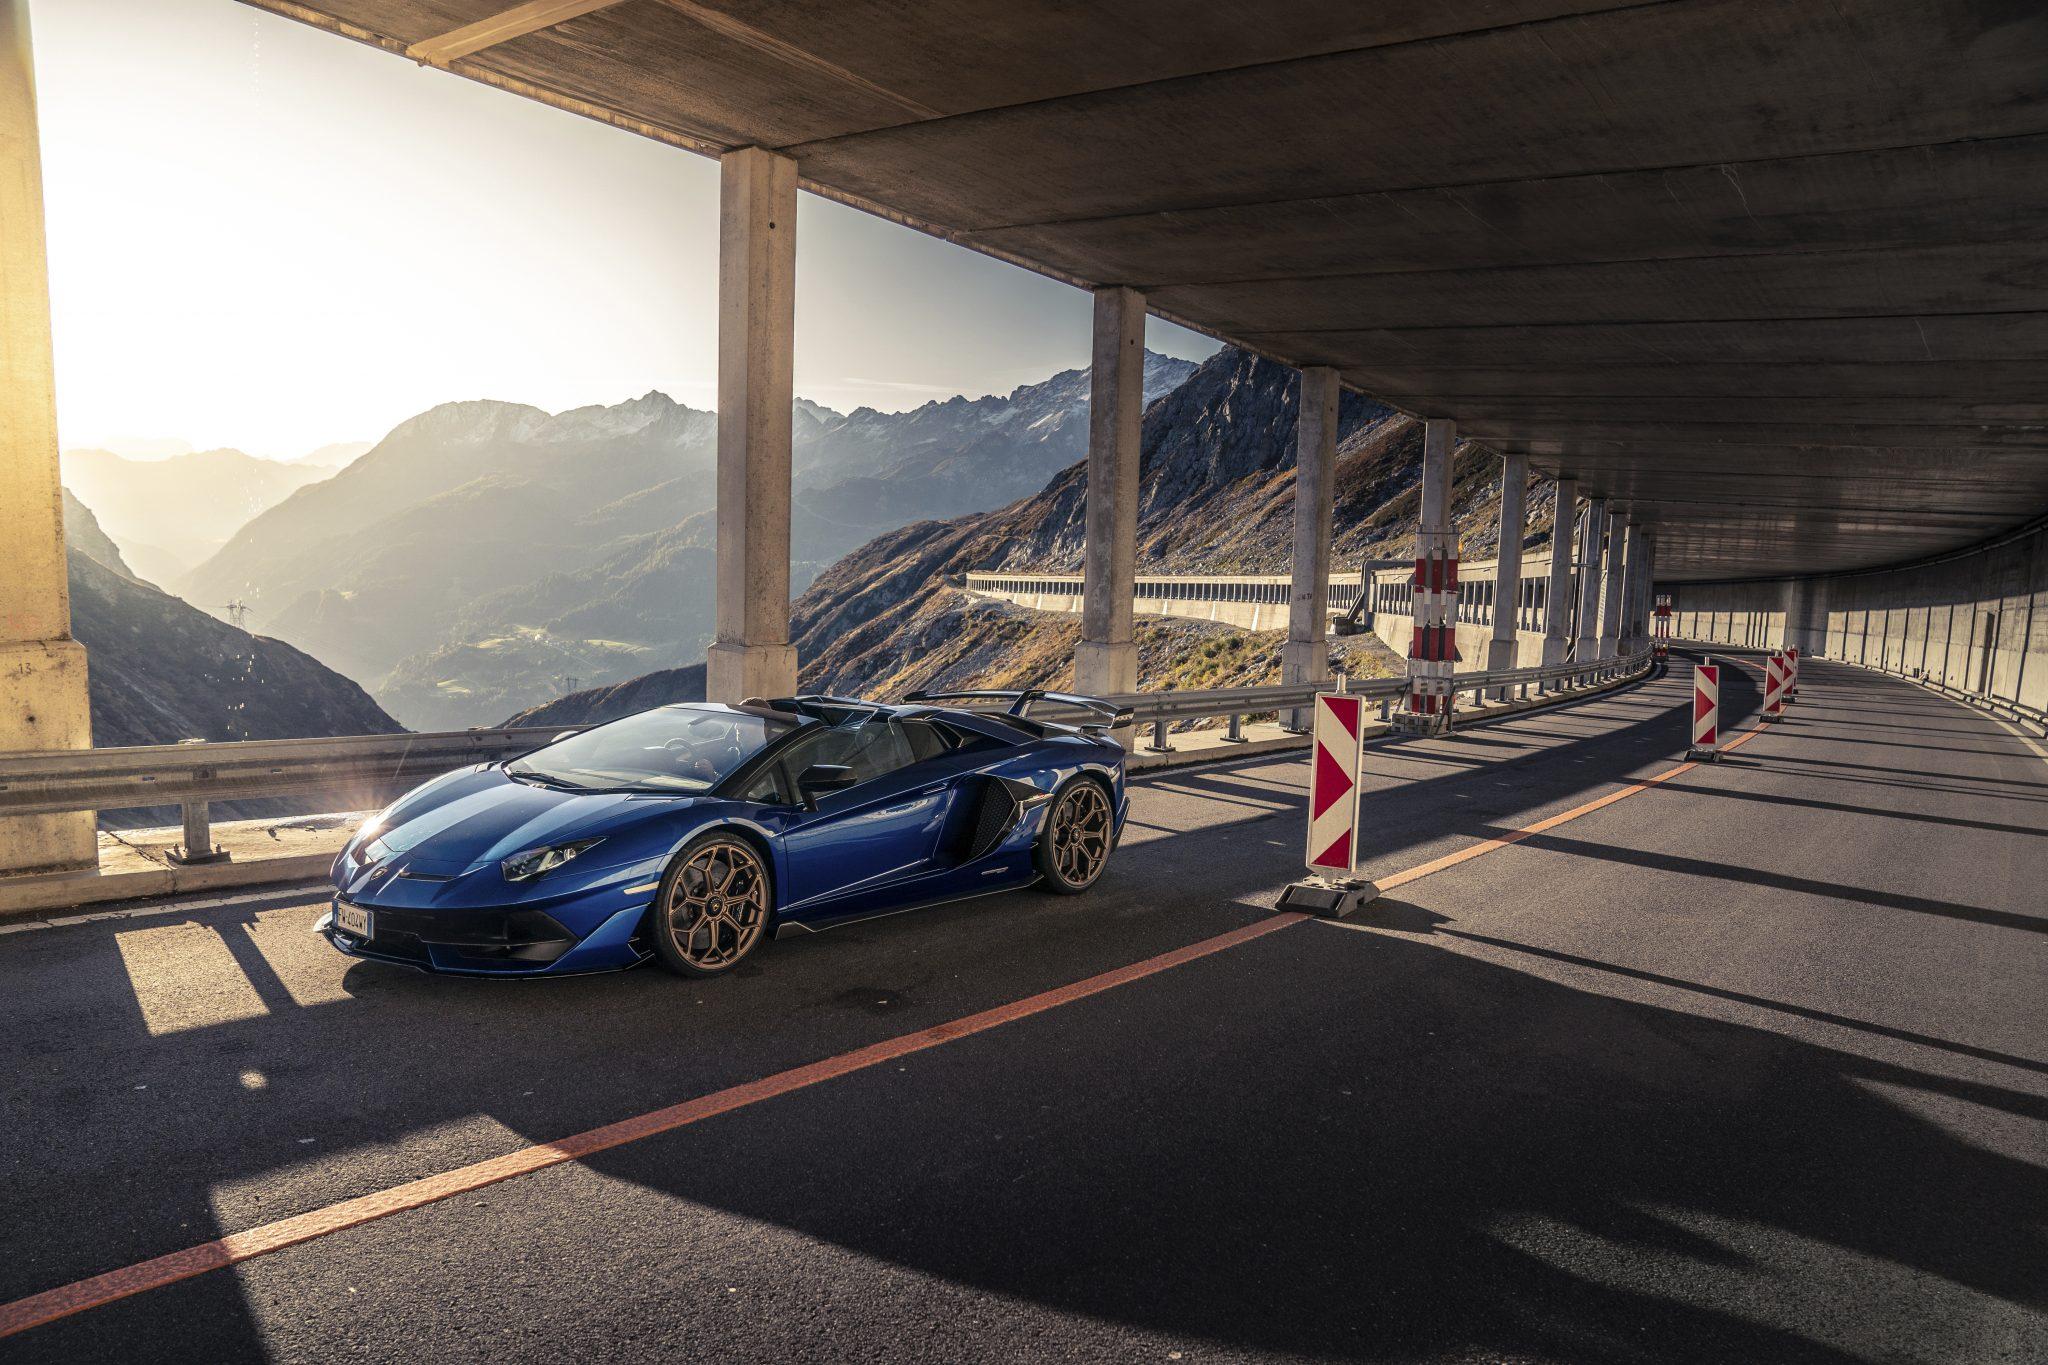 Lamborghini Aventador SVJ Roadster roadtrip